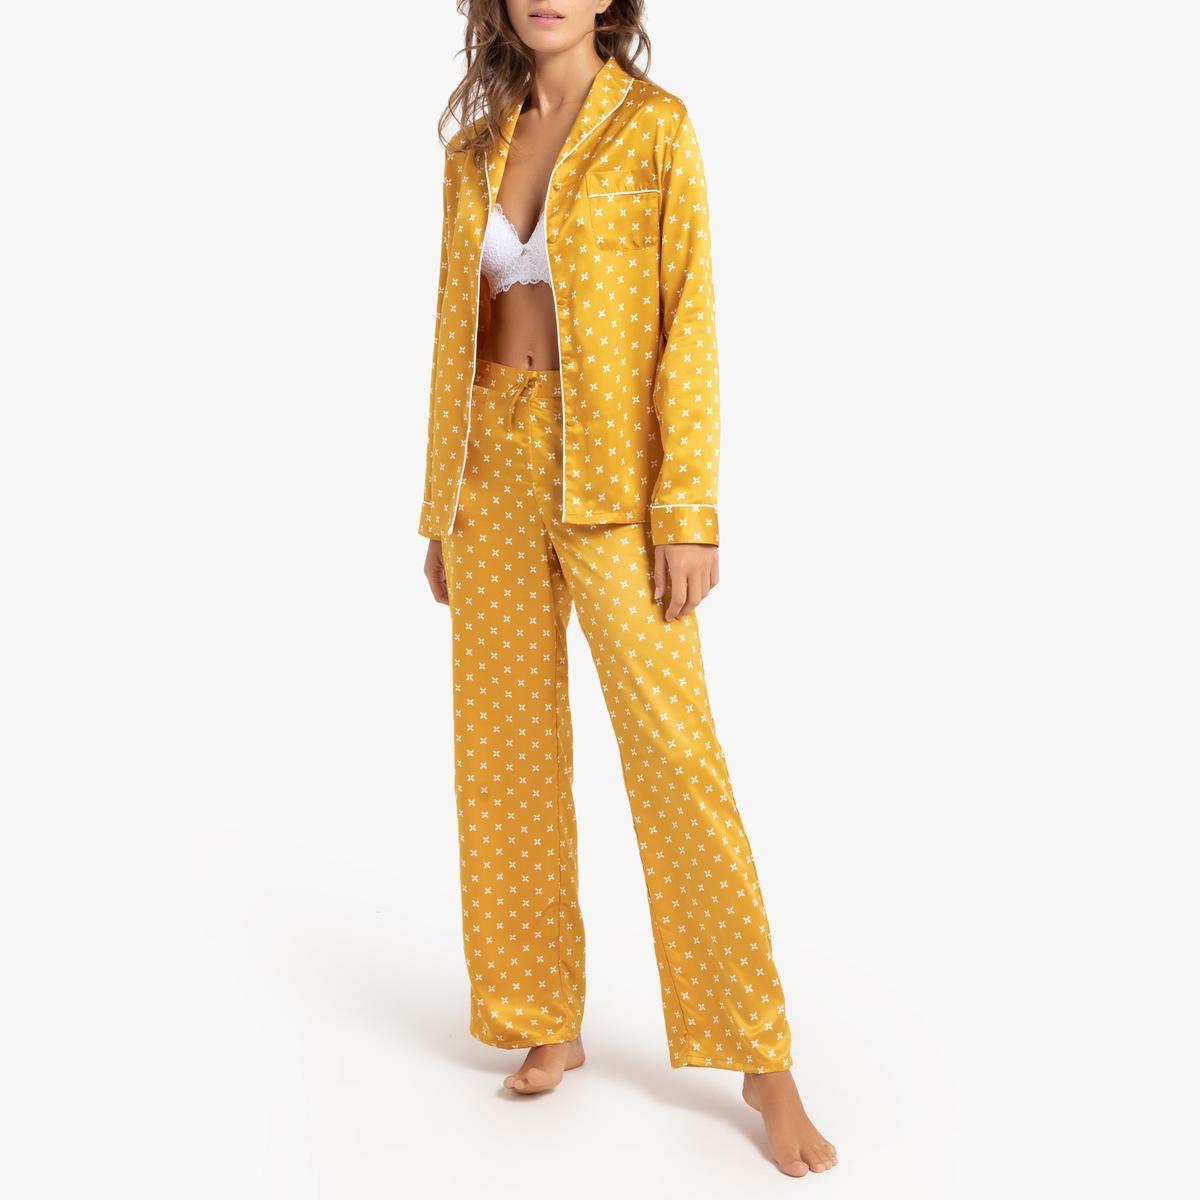 Pijama de manga larga de satén estampado